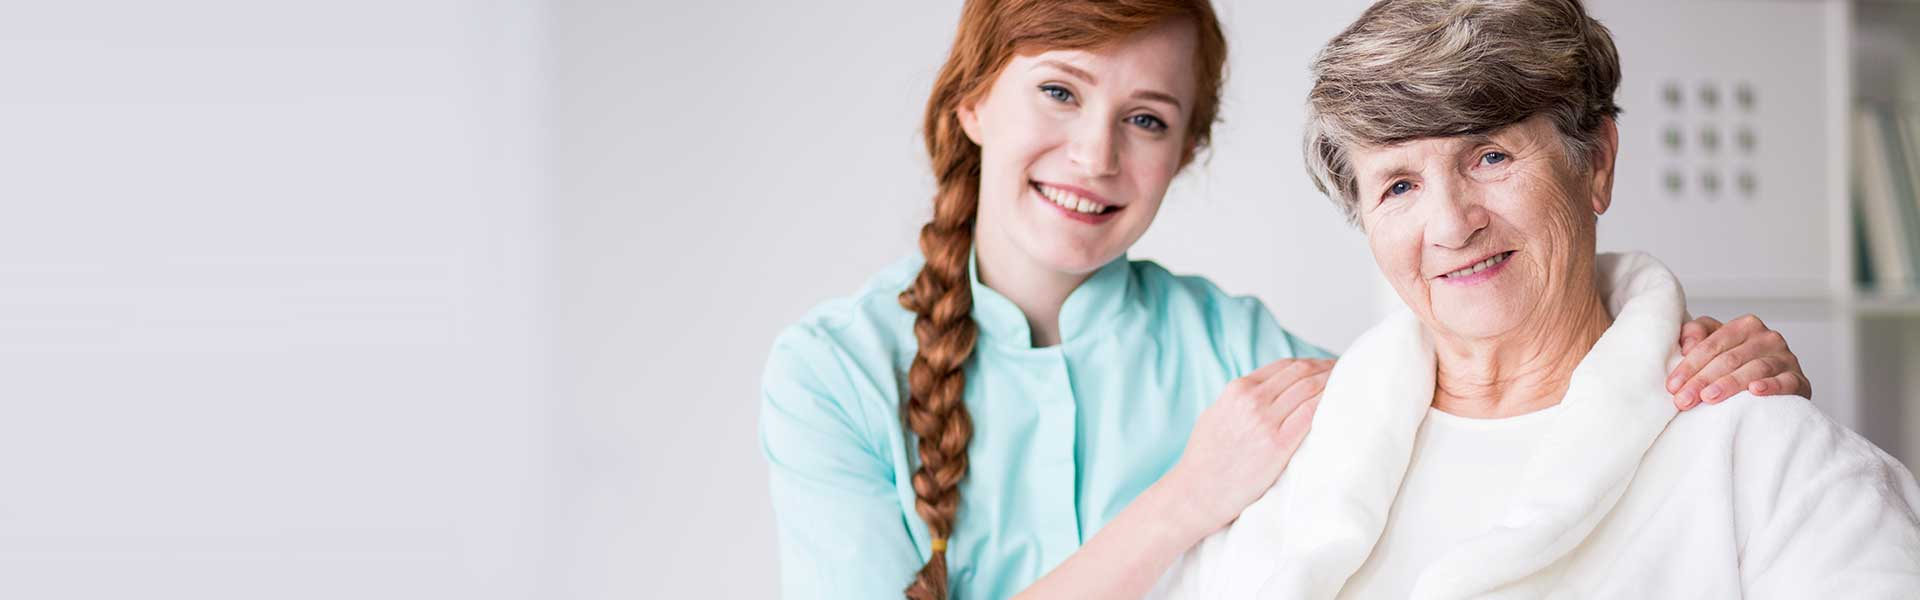 Badante Casal Selce - Contattaci per ricevere informazioni